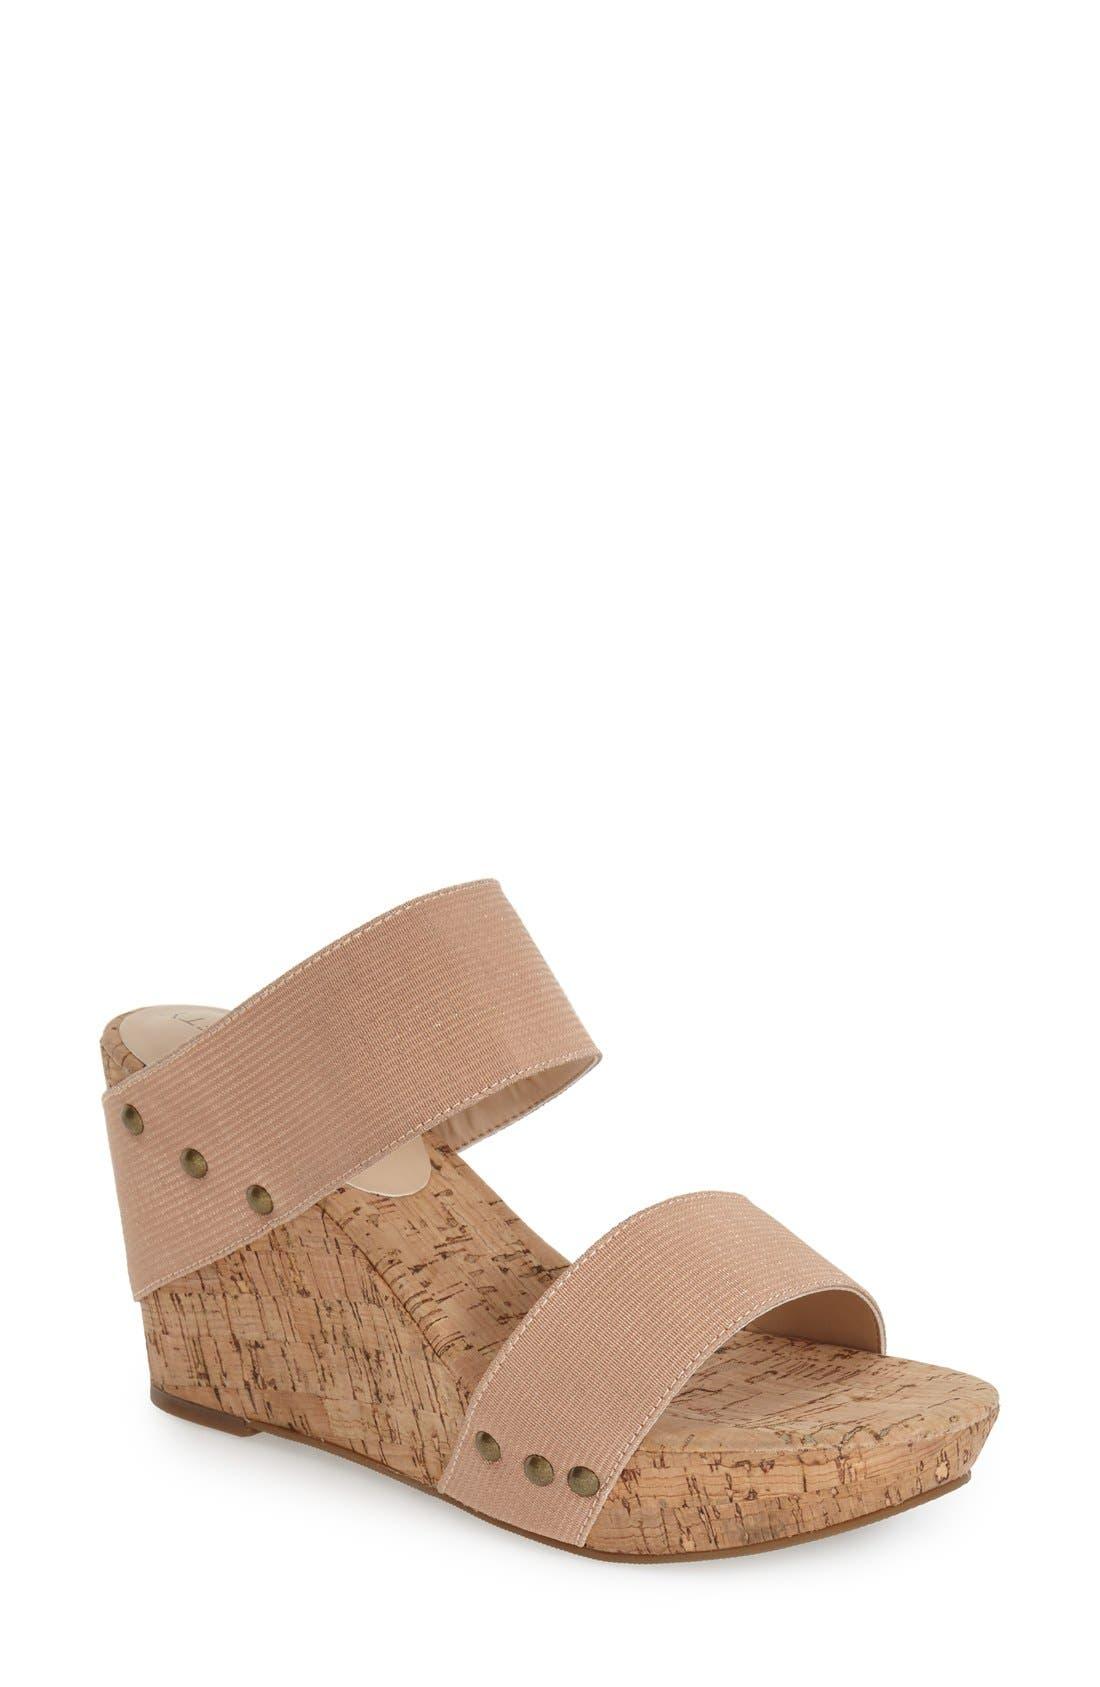 'Emilia 2' Wedge Sandal,                             Main thumbnail 3, color,